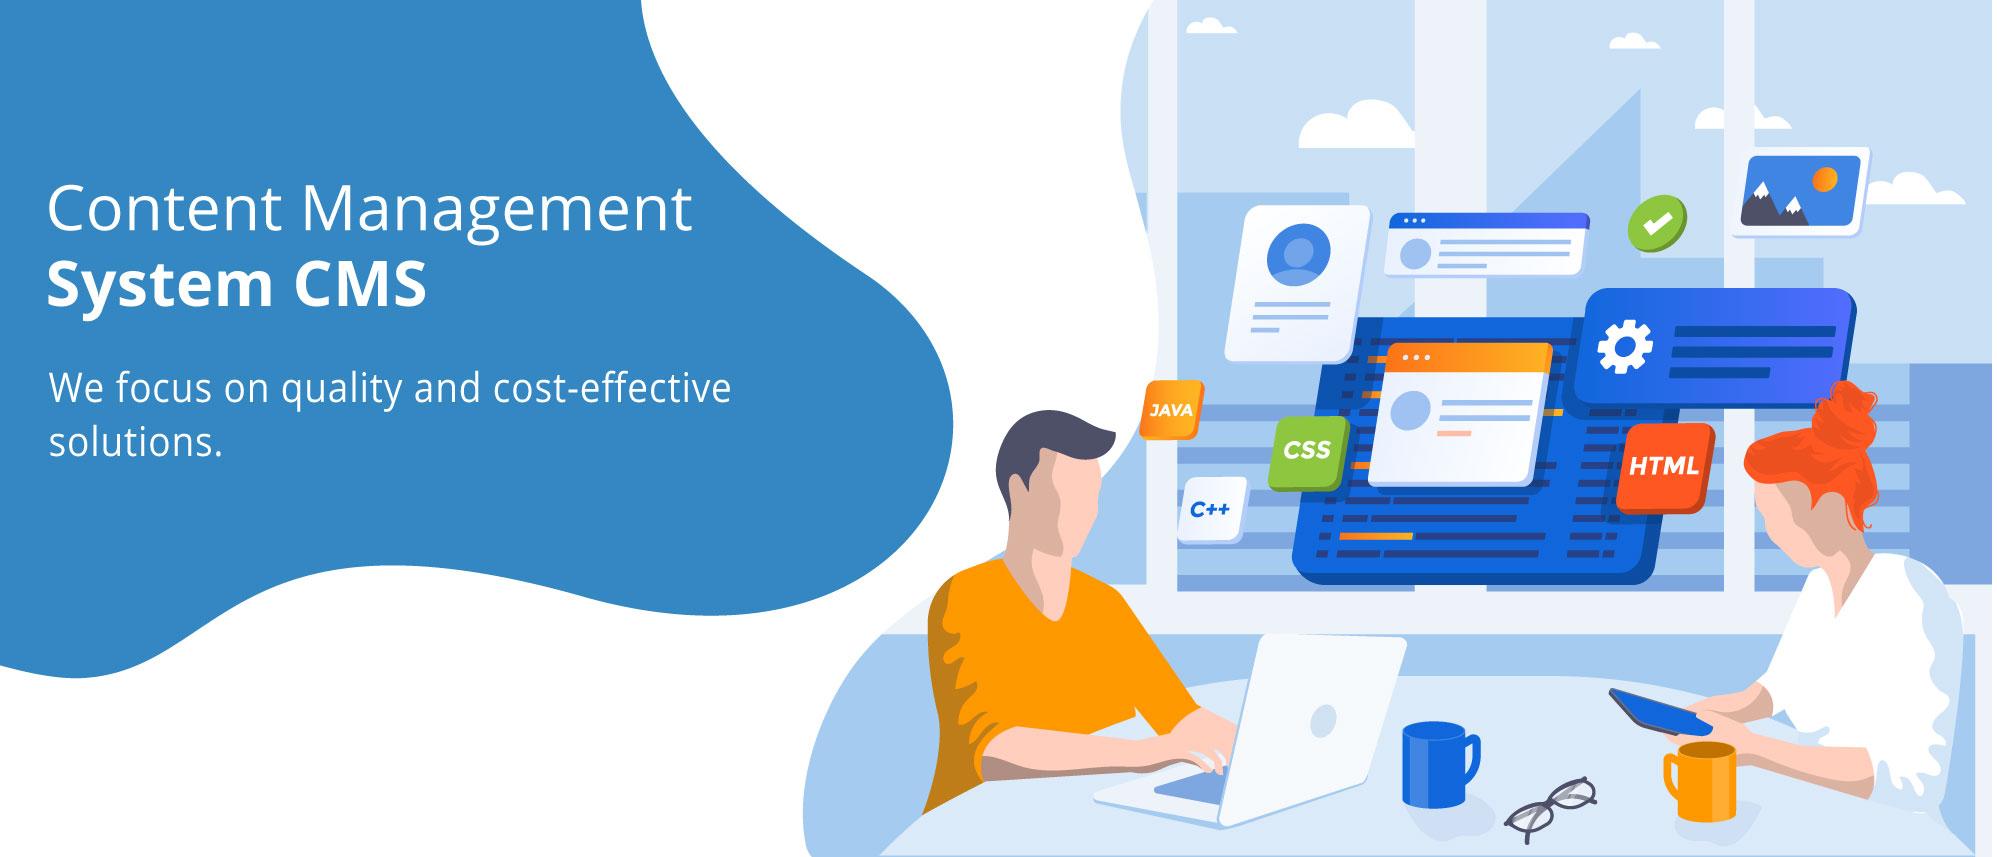 CMS Content Management System, Web Design & Web Development, CMS Content Management System, Web Design & Web Development Lebanon Beirut, CMS Content Management System, Web Design & Web Development In Lebanon Beirut